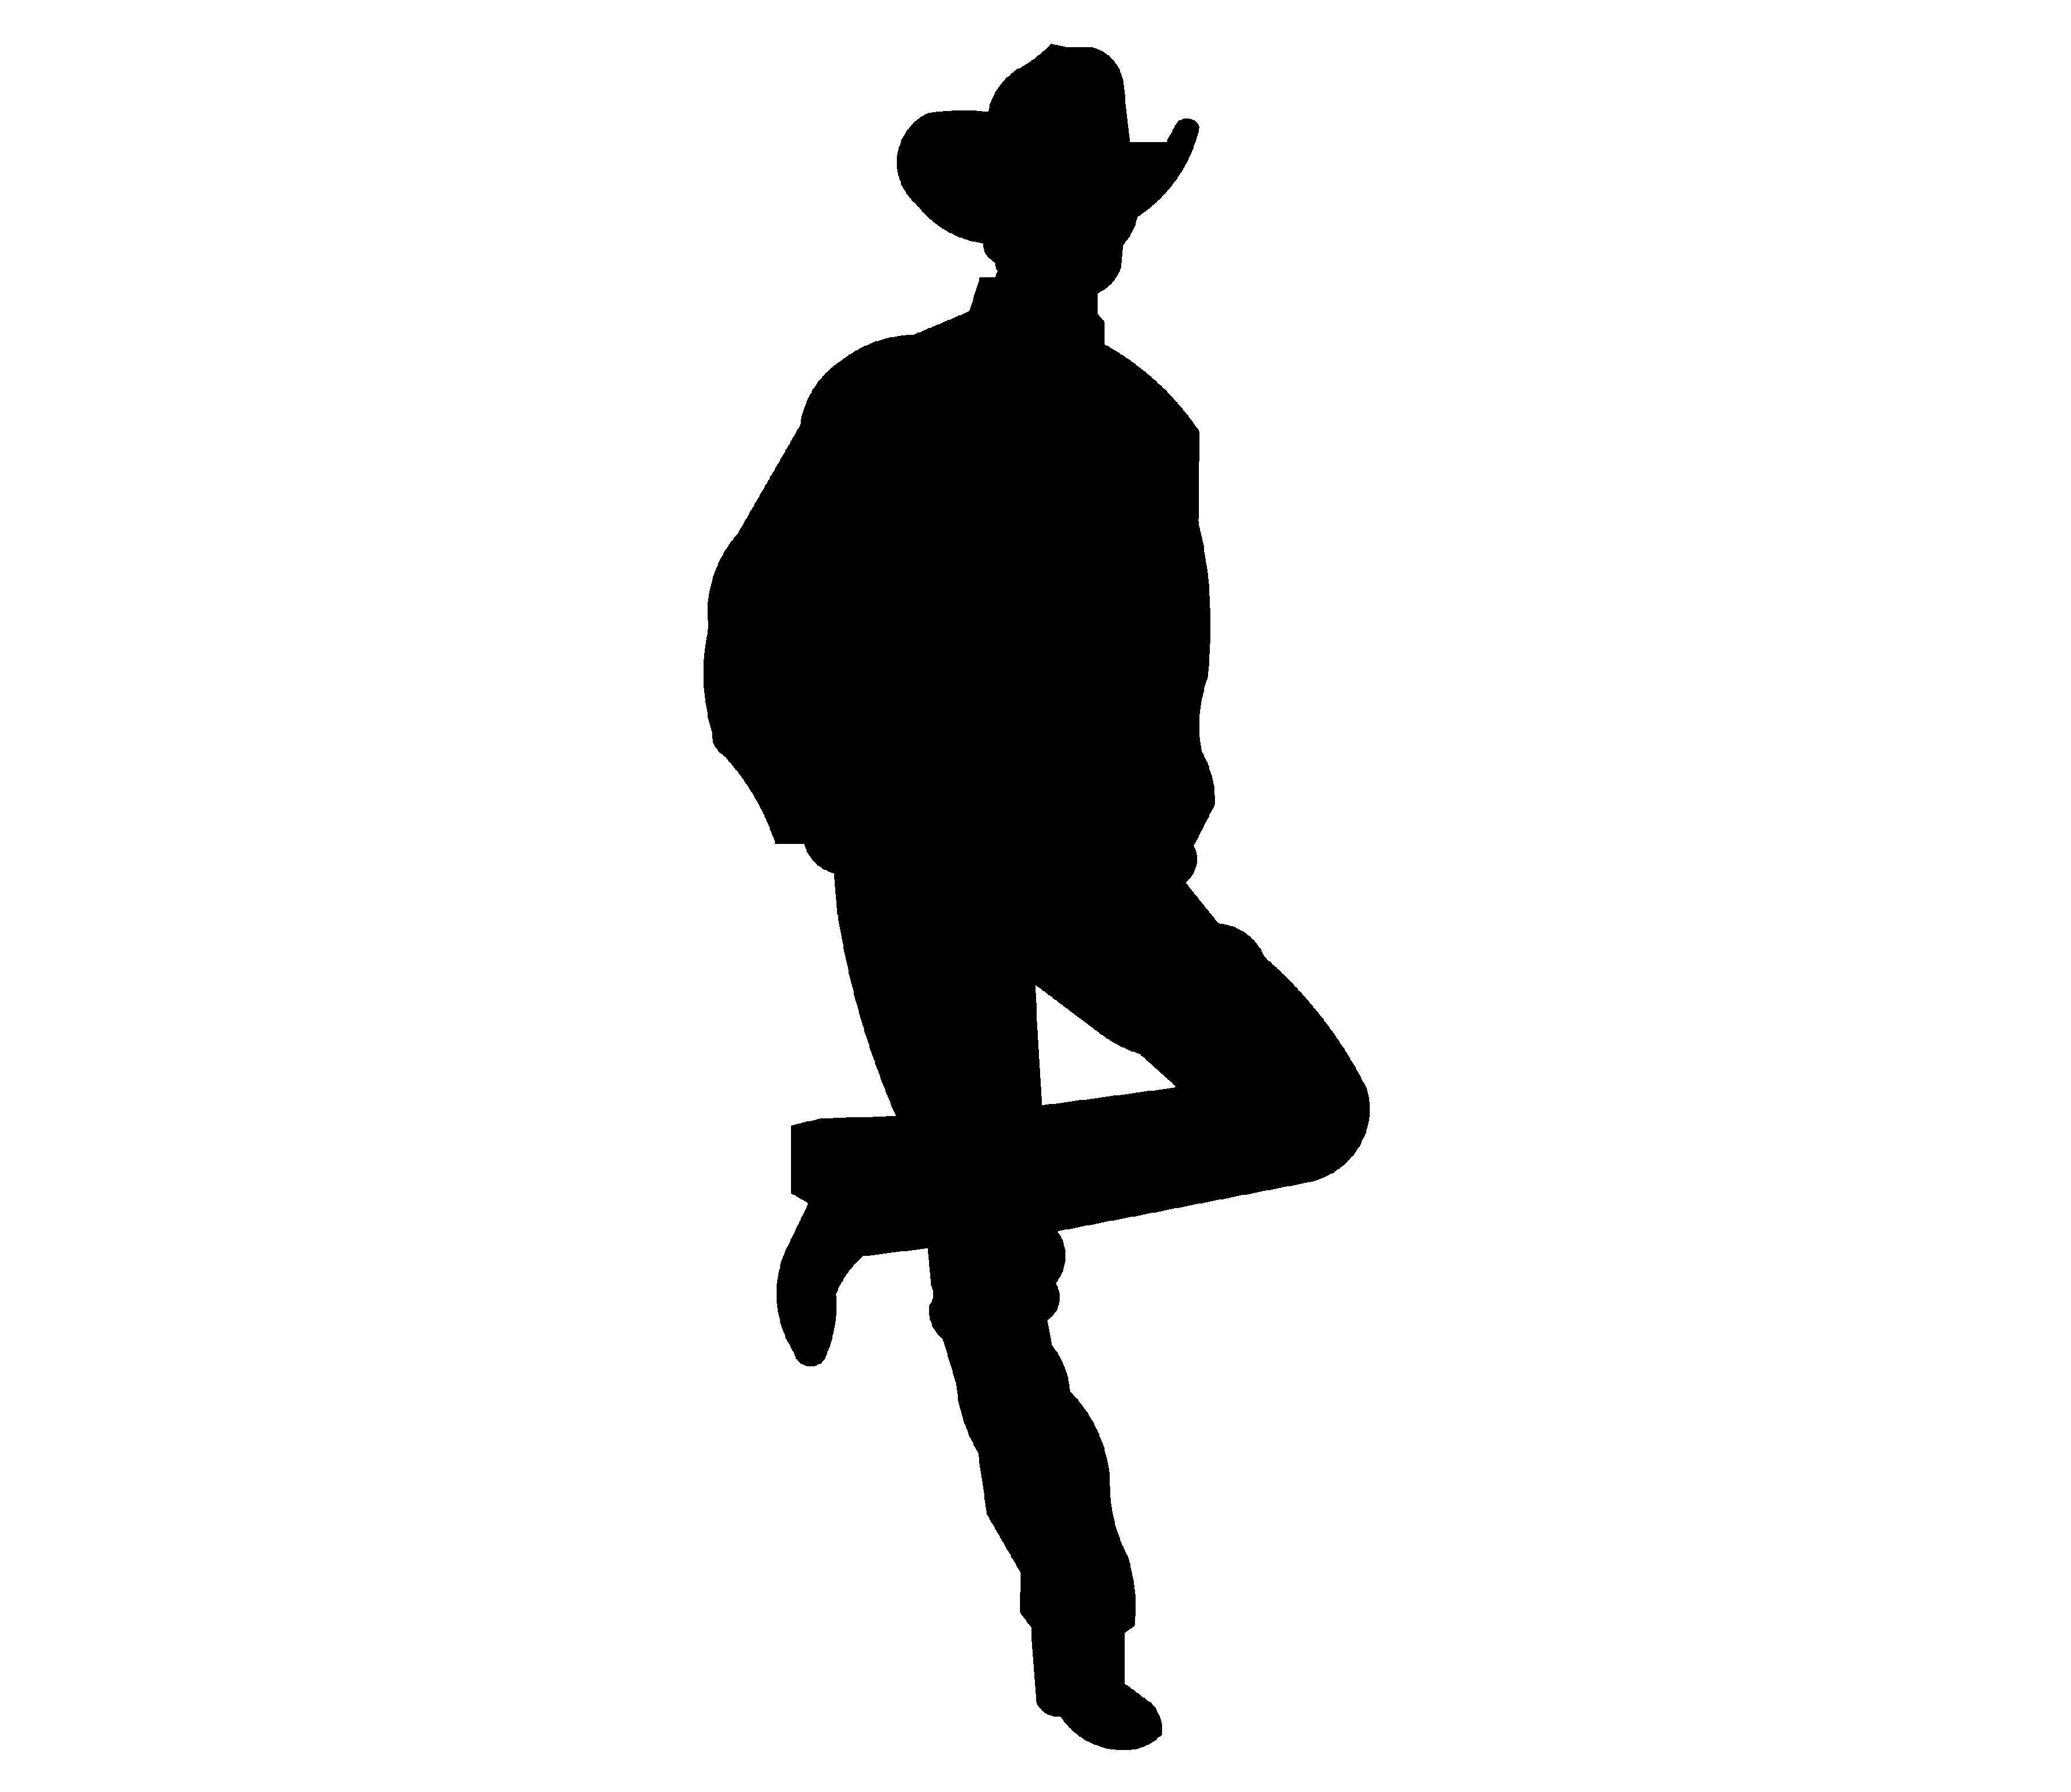 Silhouette cowboy clipart svg Free Cowboy Silhouette, Download Free Clip Art, Free Clip ... svg